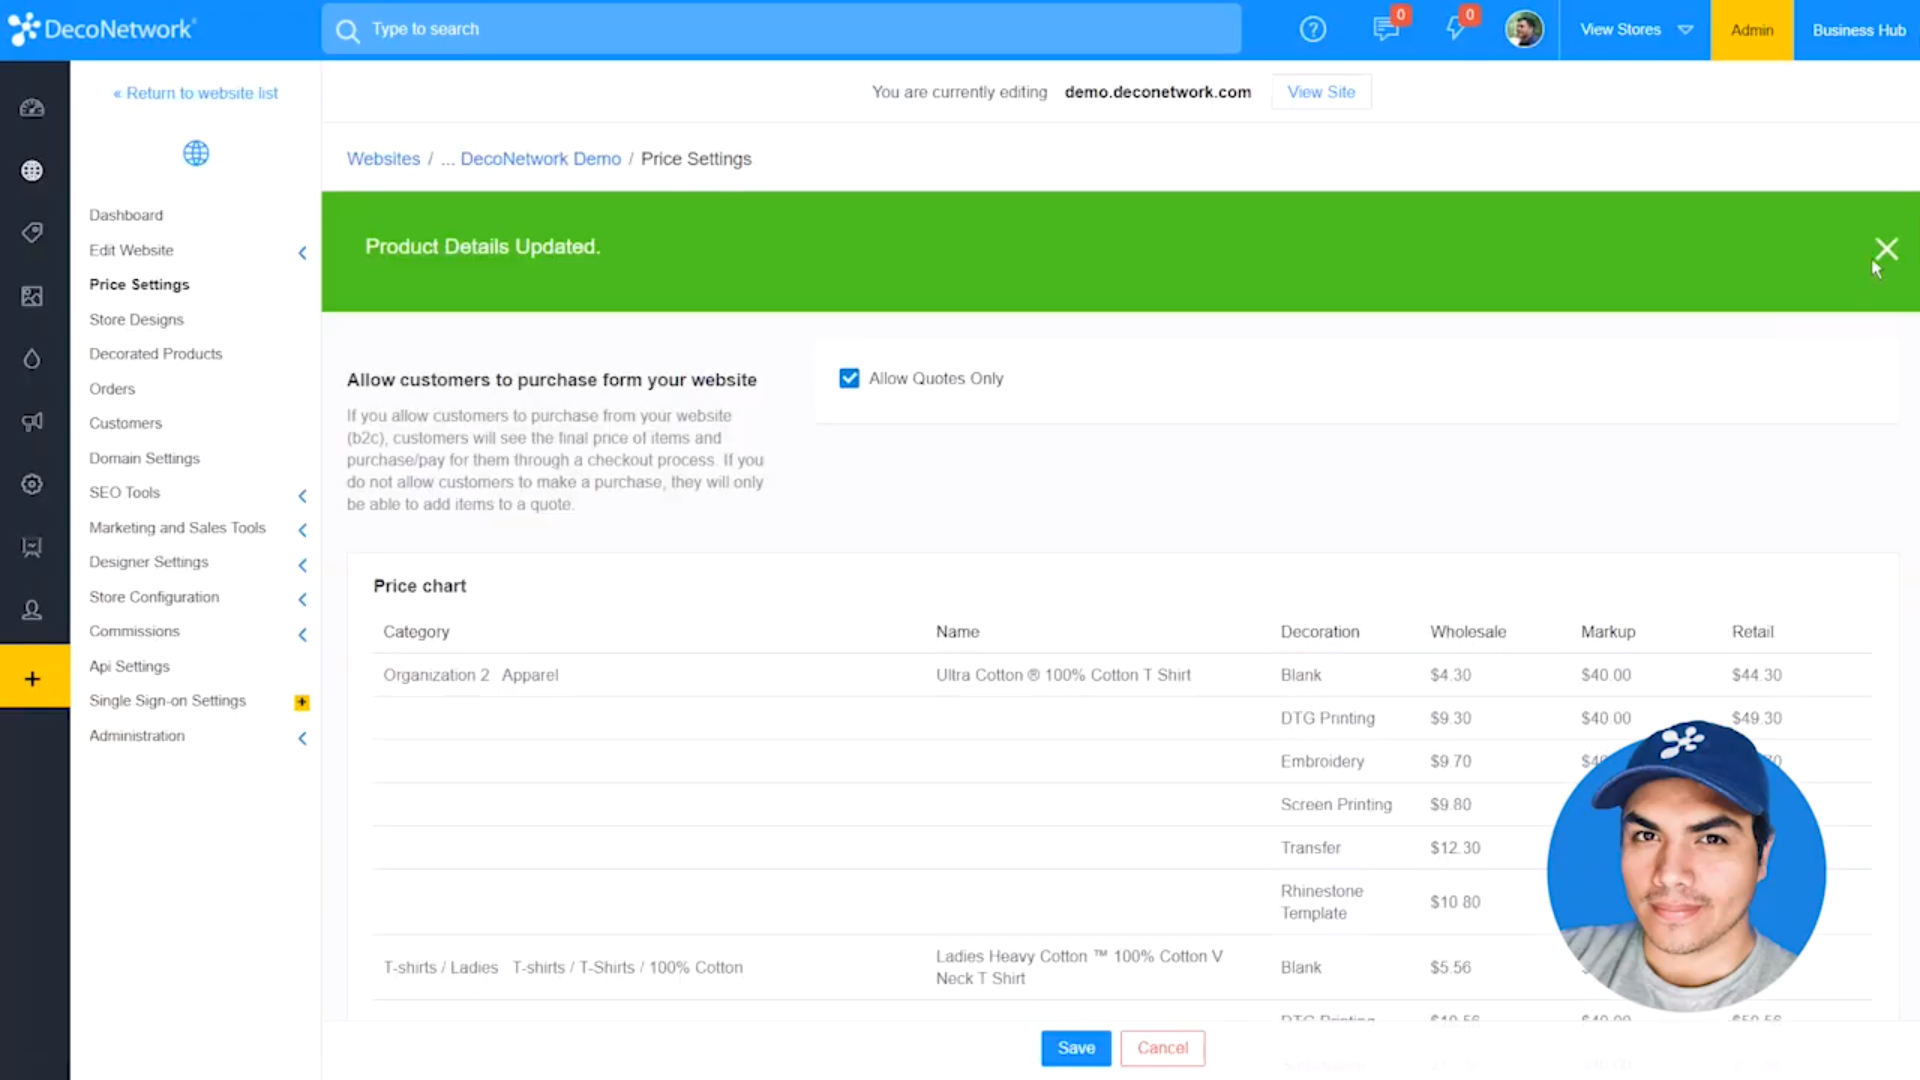 DecoNetwork price settings